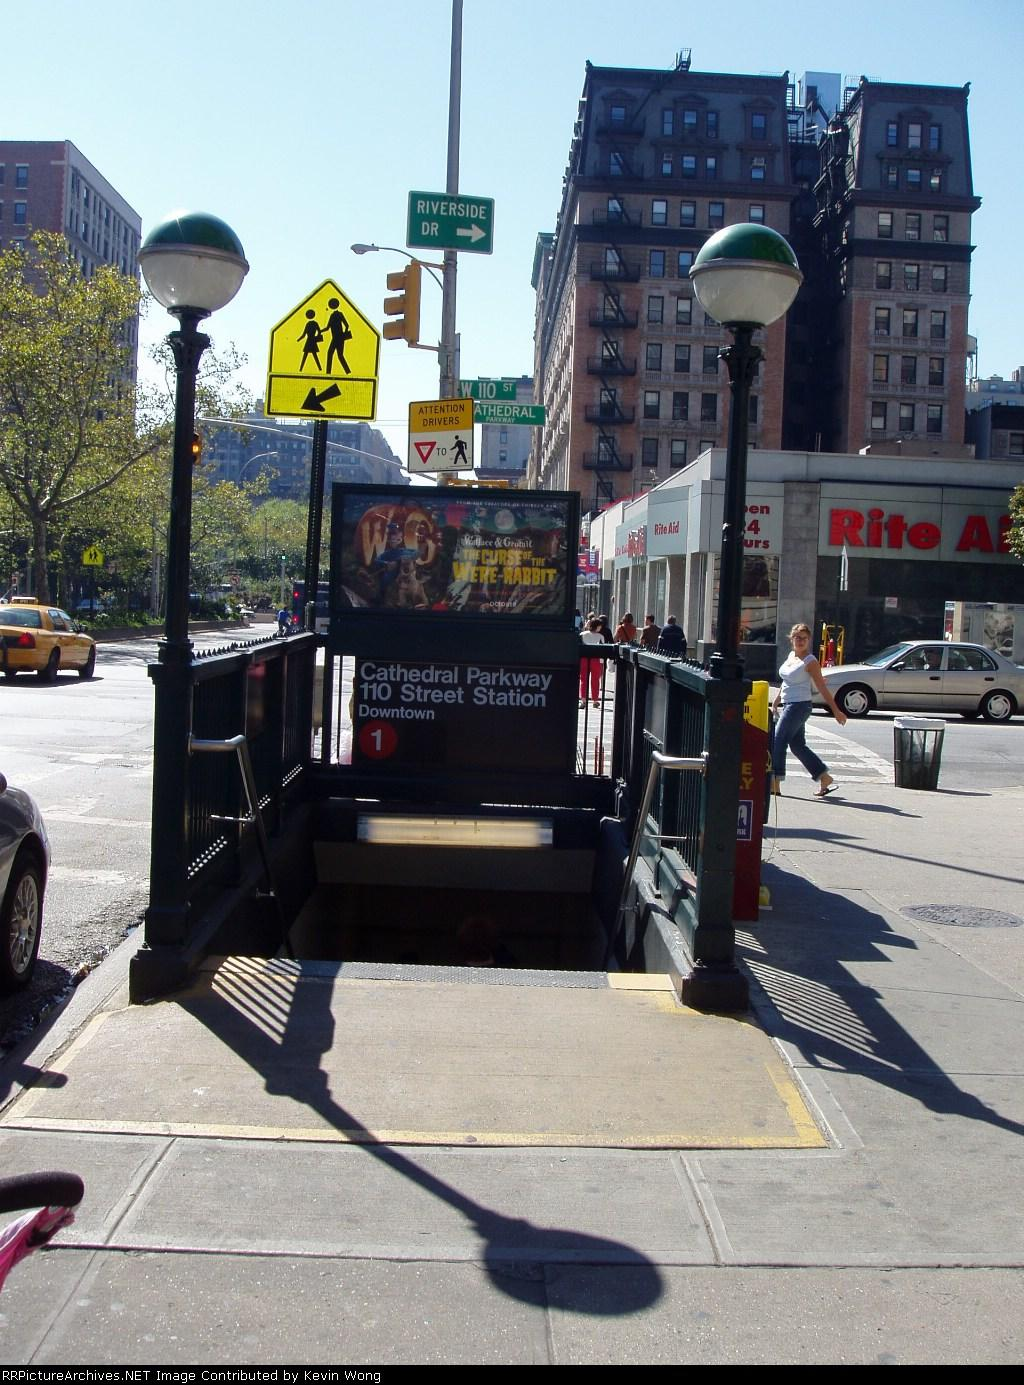 (216k, 1024x1385)<br><b>Country:</b> United States<br><b>City:</b> New York<br><b>System:</b> New York City Transit<br><b>Line:</b> IRT West Side Line<br><b>Location:</b> 110th Street<br><b>Photo by:</b> Kevin Wong<br><b>Date:</b> 10/2/2005<br><b>Notes:</b> Station entrance.<br><b>Viewed (this week/total):</b> 3 / 6341